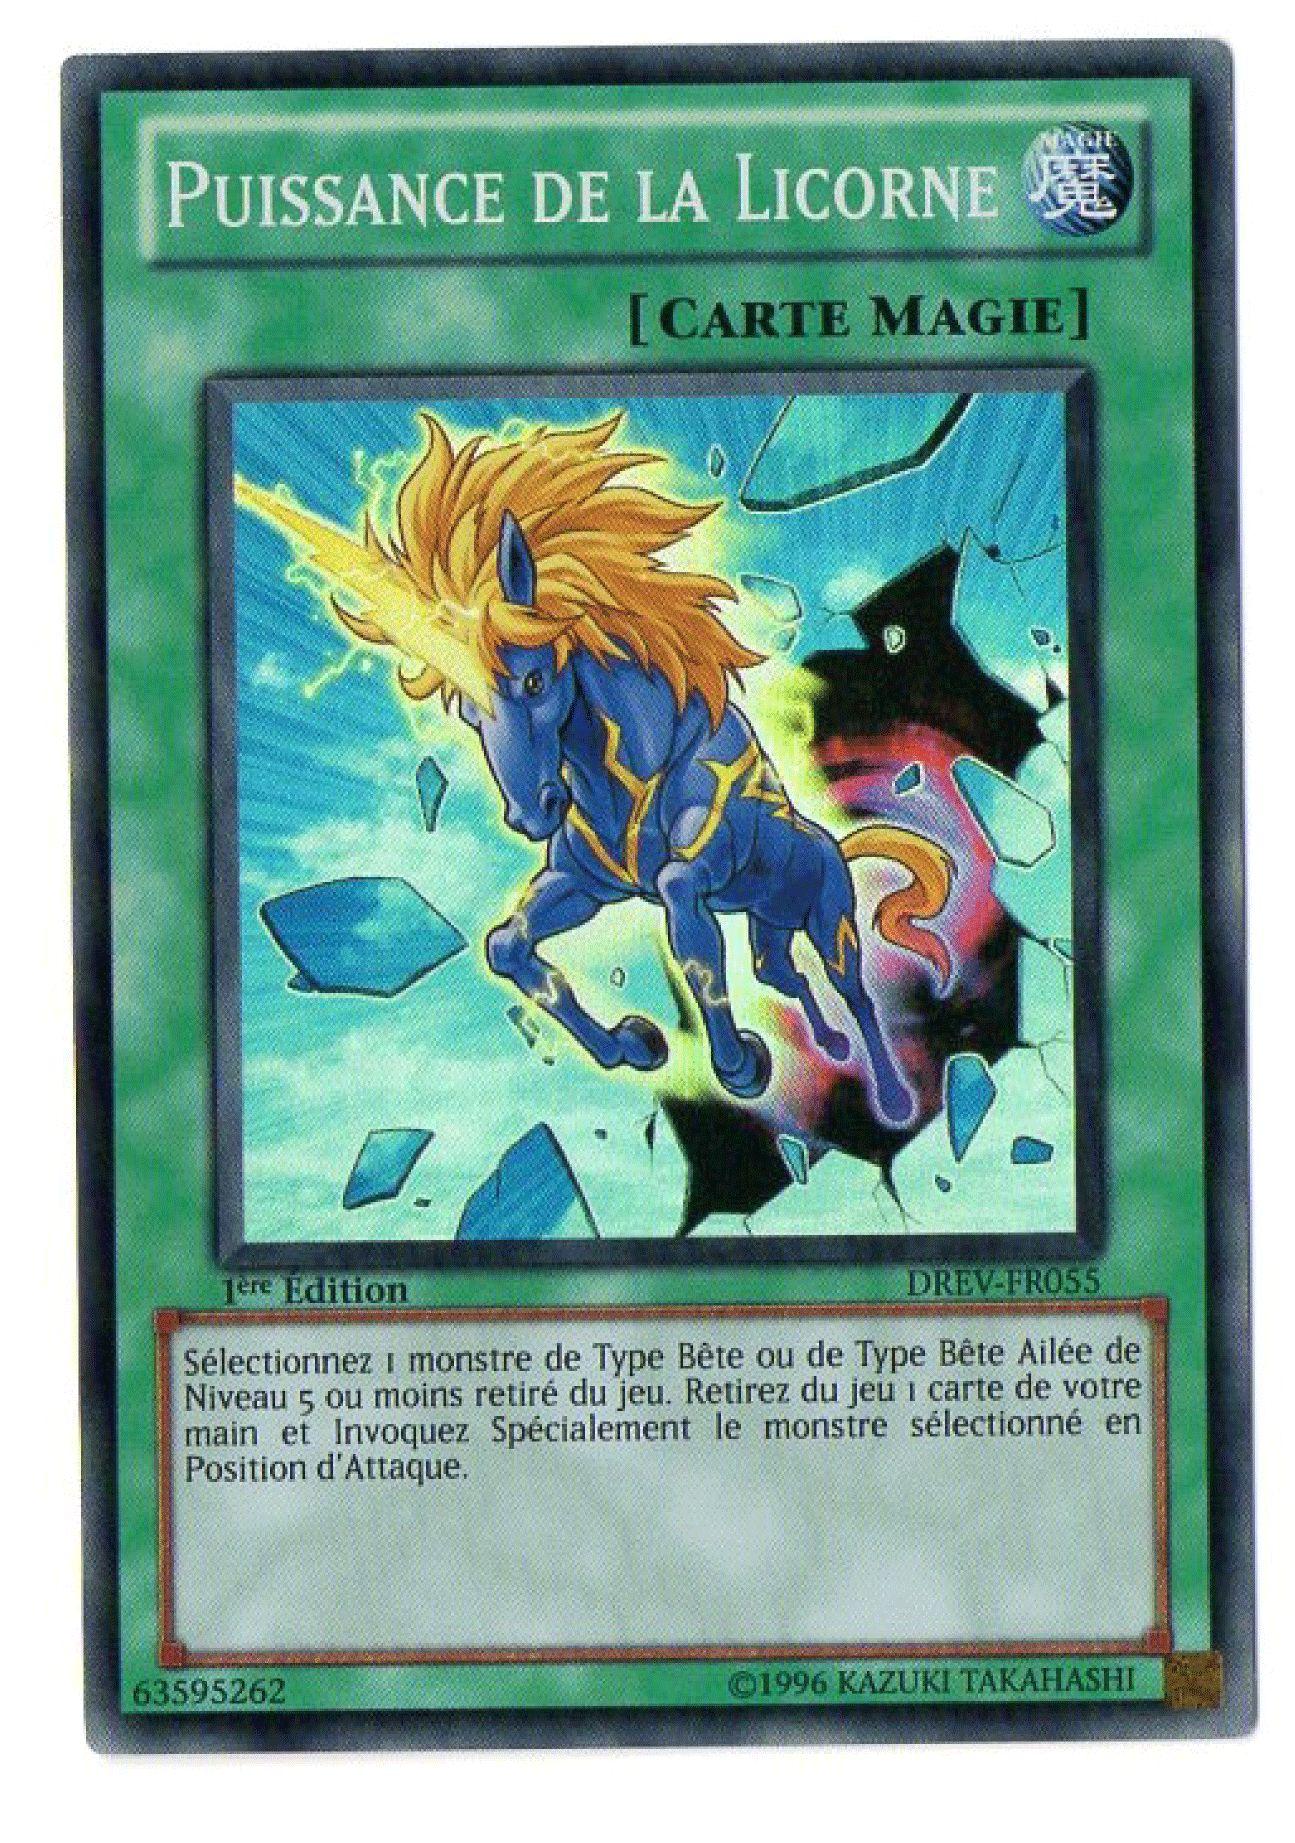 DREV-FR055 Puissance de la Licorne Super Rare Carte Yu-Gi-Oh 1ere Edition